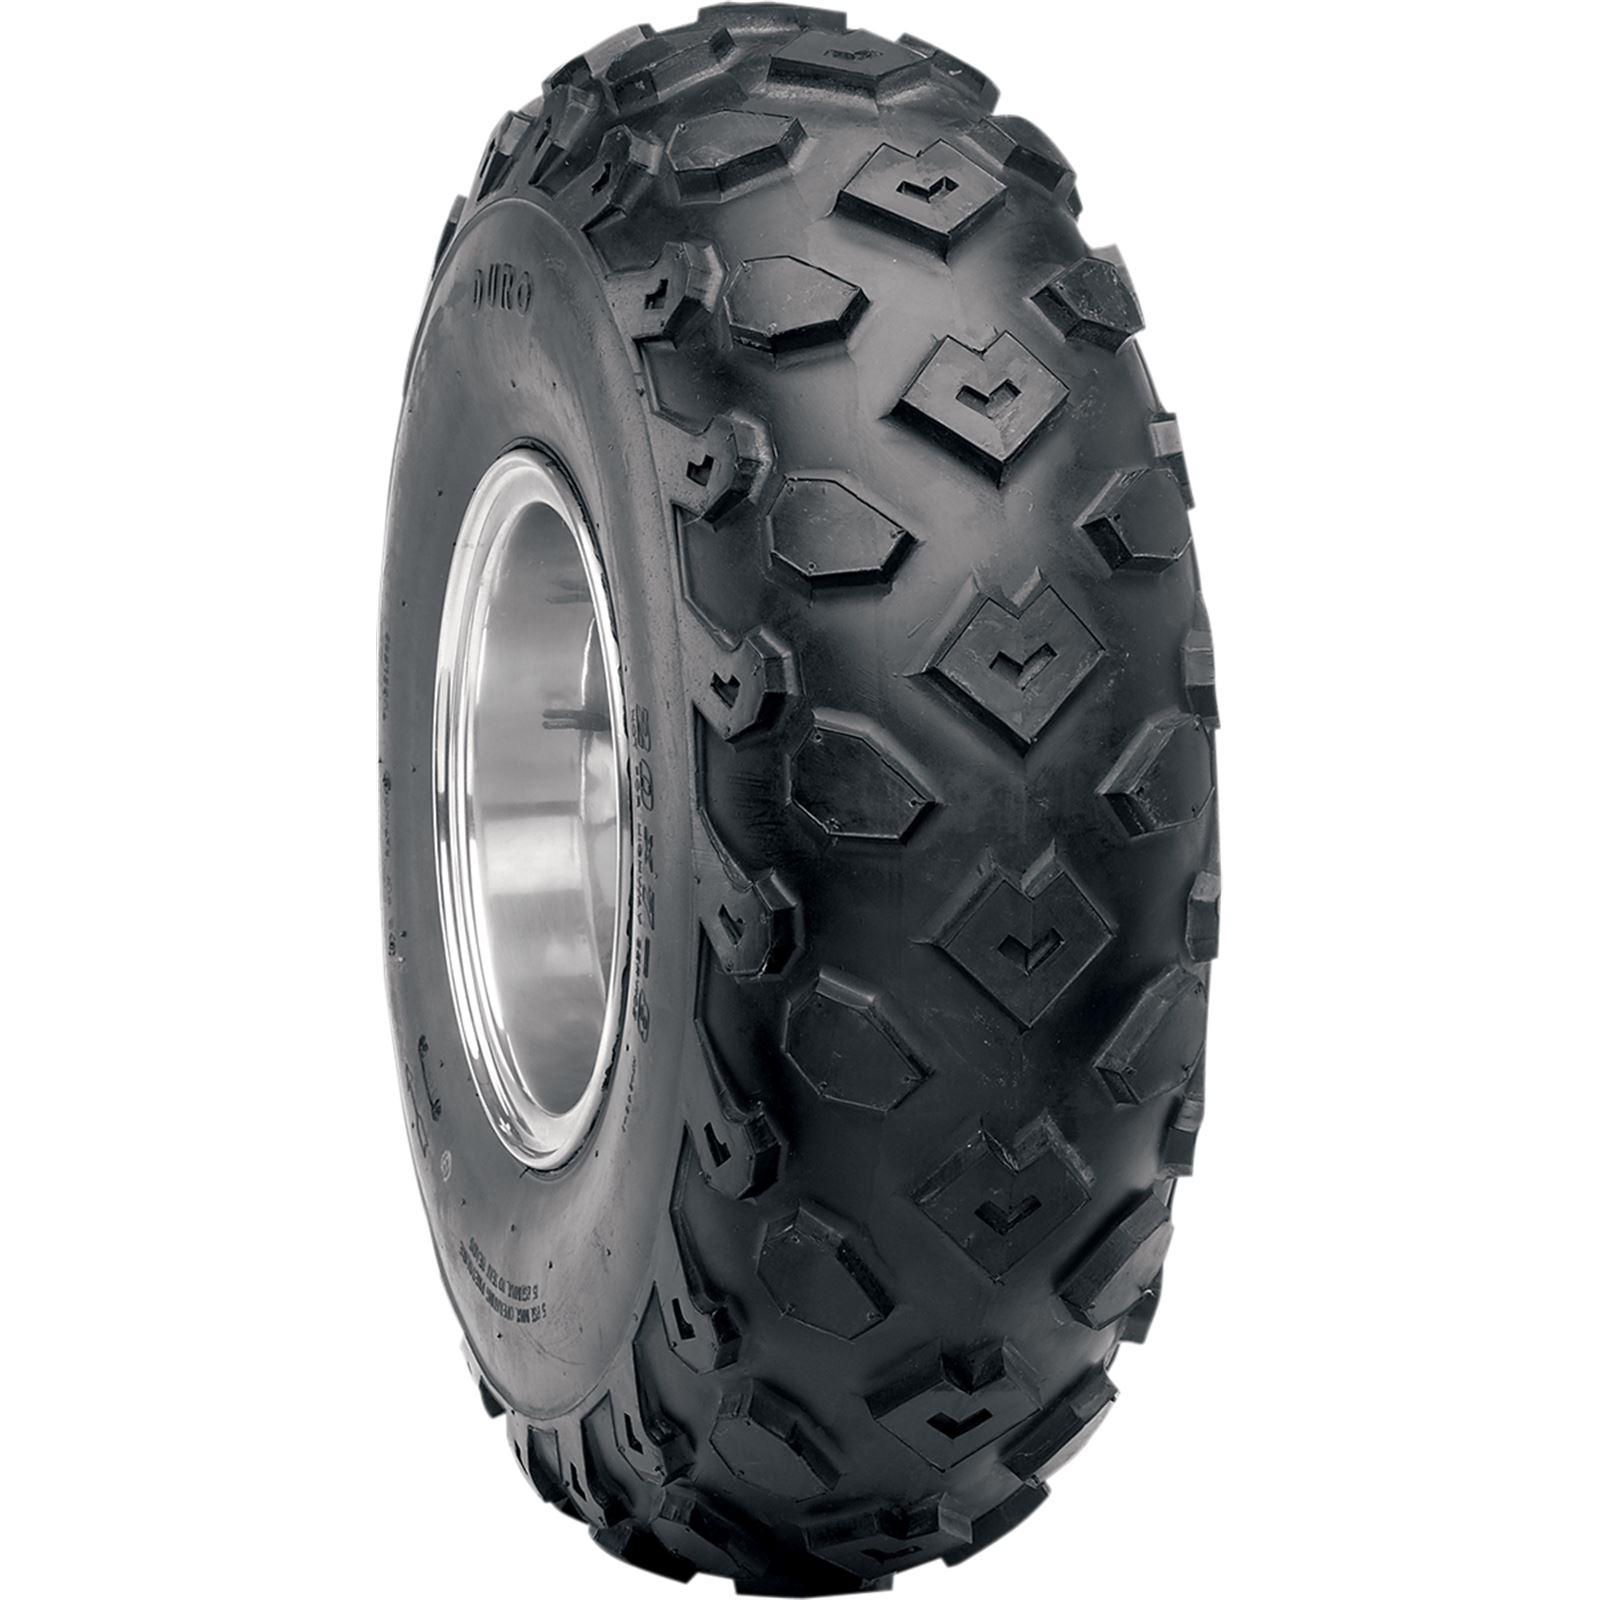 Duro Tire HF246 - 21X7-10 - 2 Ply